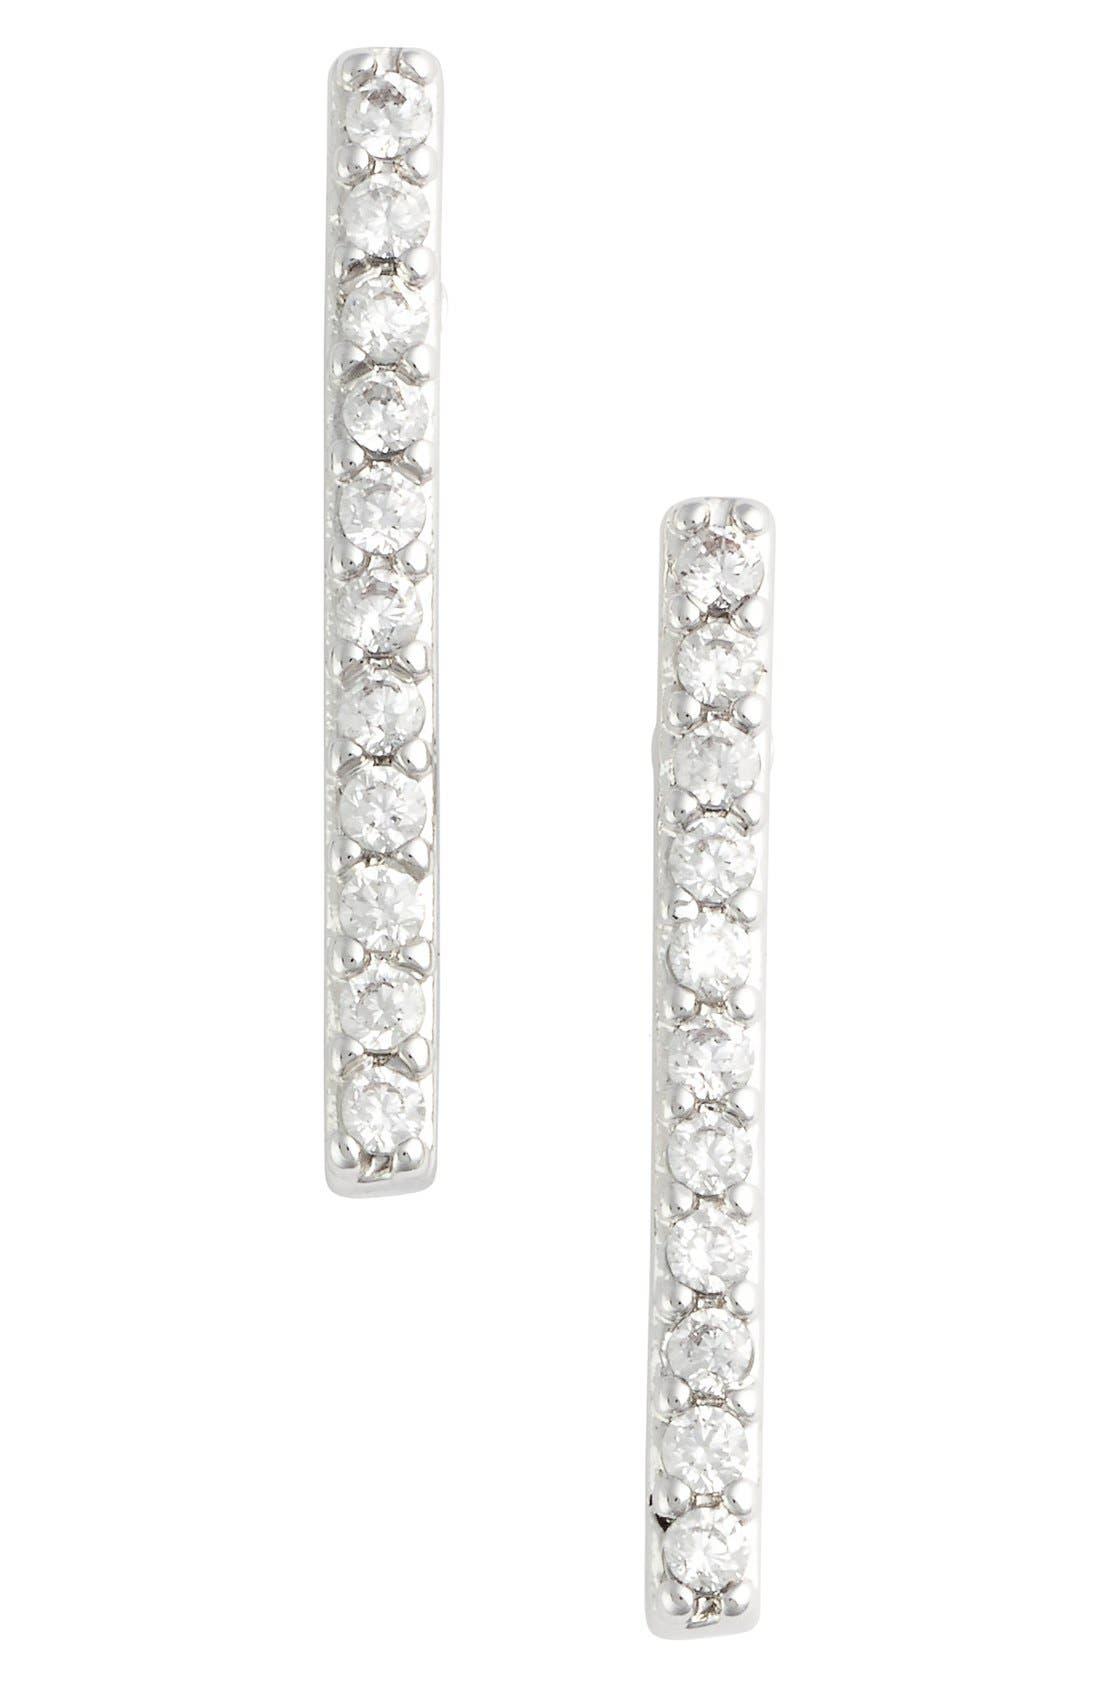 'Micro' Pavé Bar Stud Earrings,                             Main thumbnail 1, color,                             040